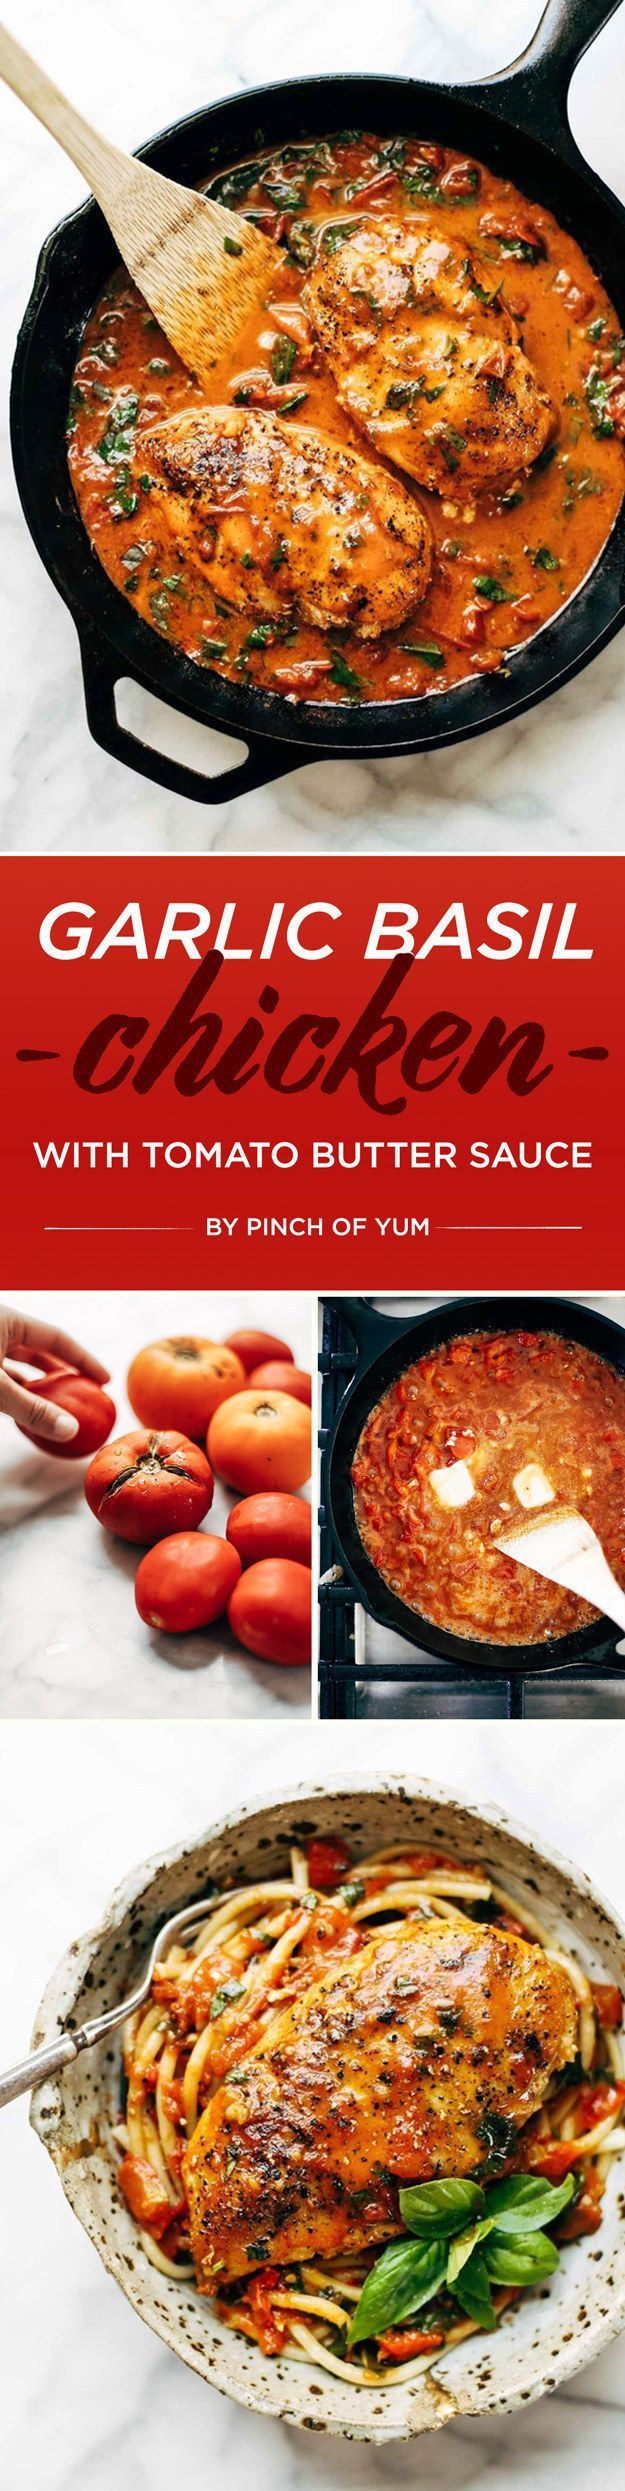 Garlic Basil Chicken with Tomato Butter Sauce